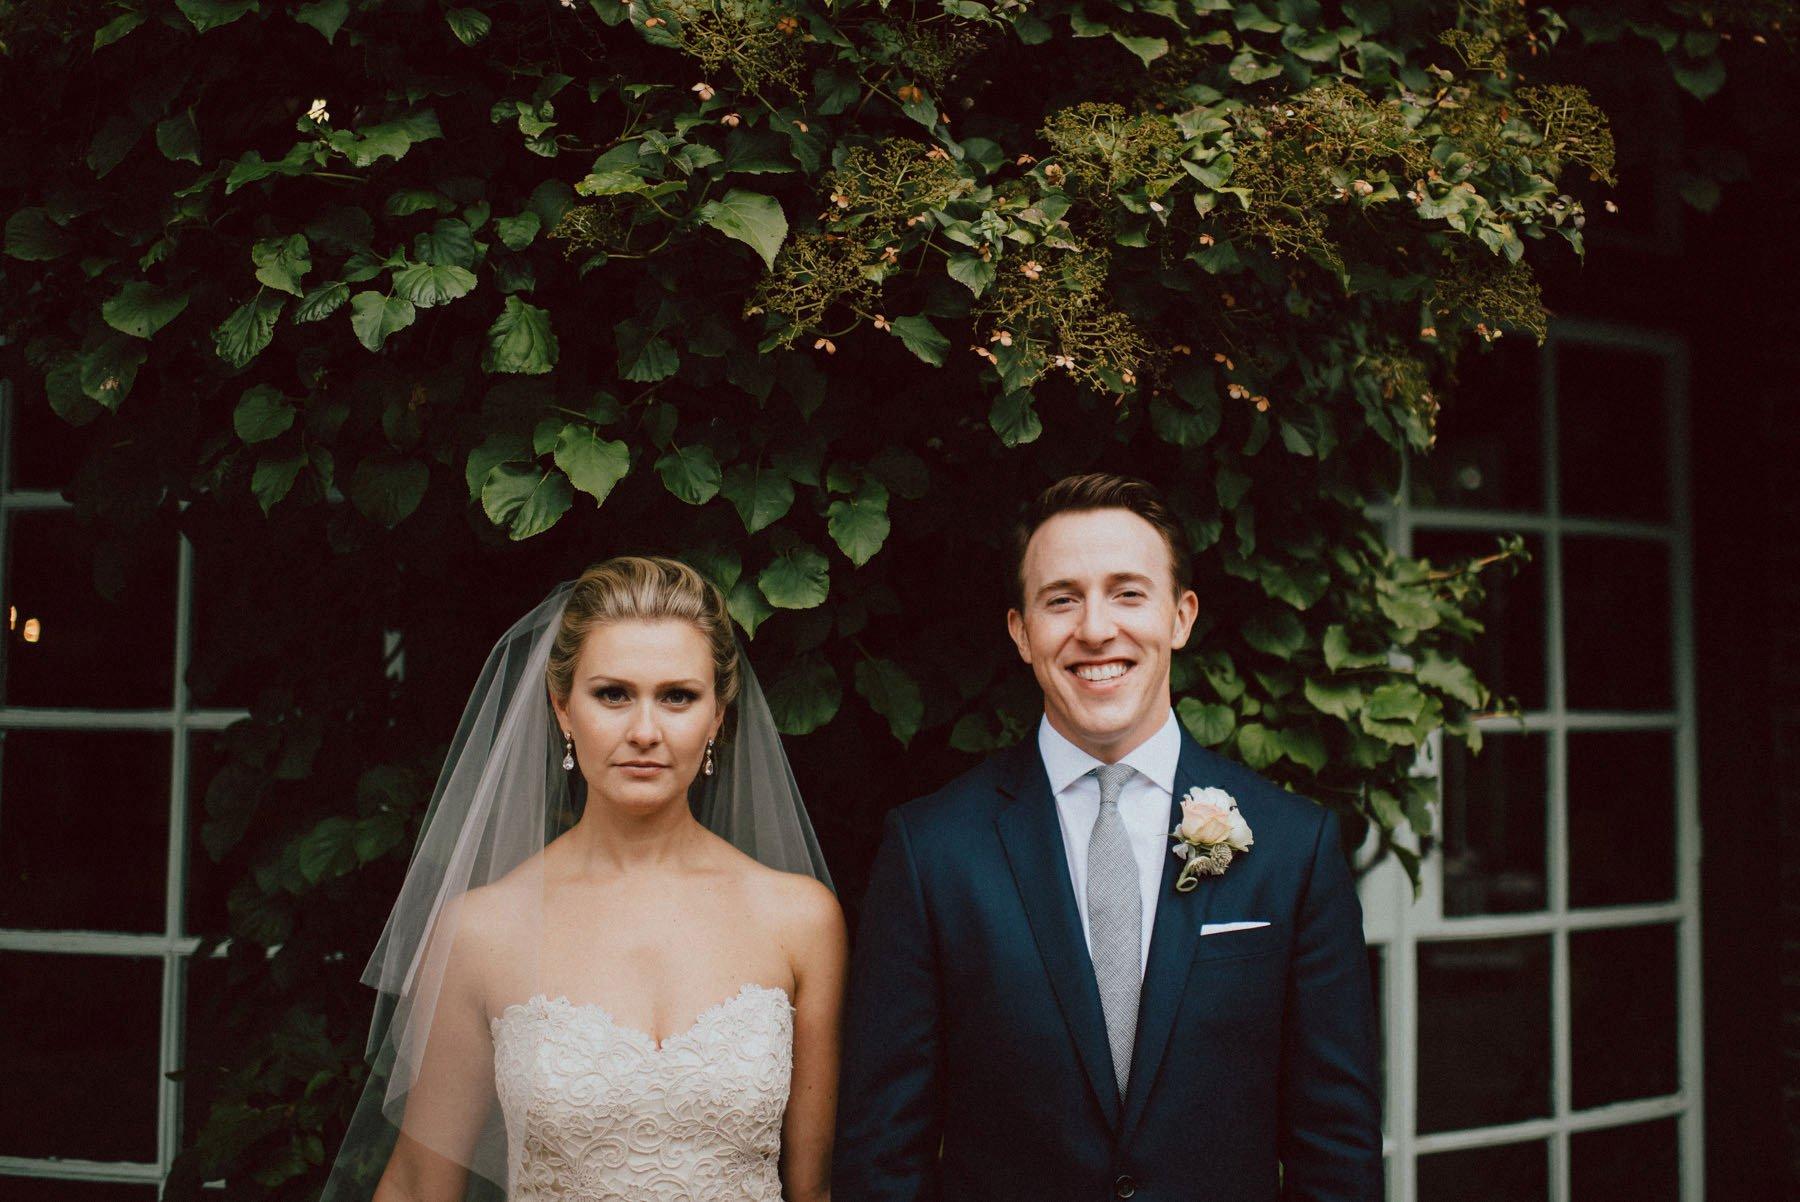 greenville-country-club-wedding-67.jpg